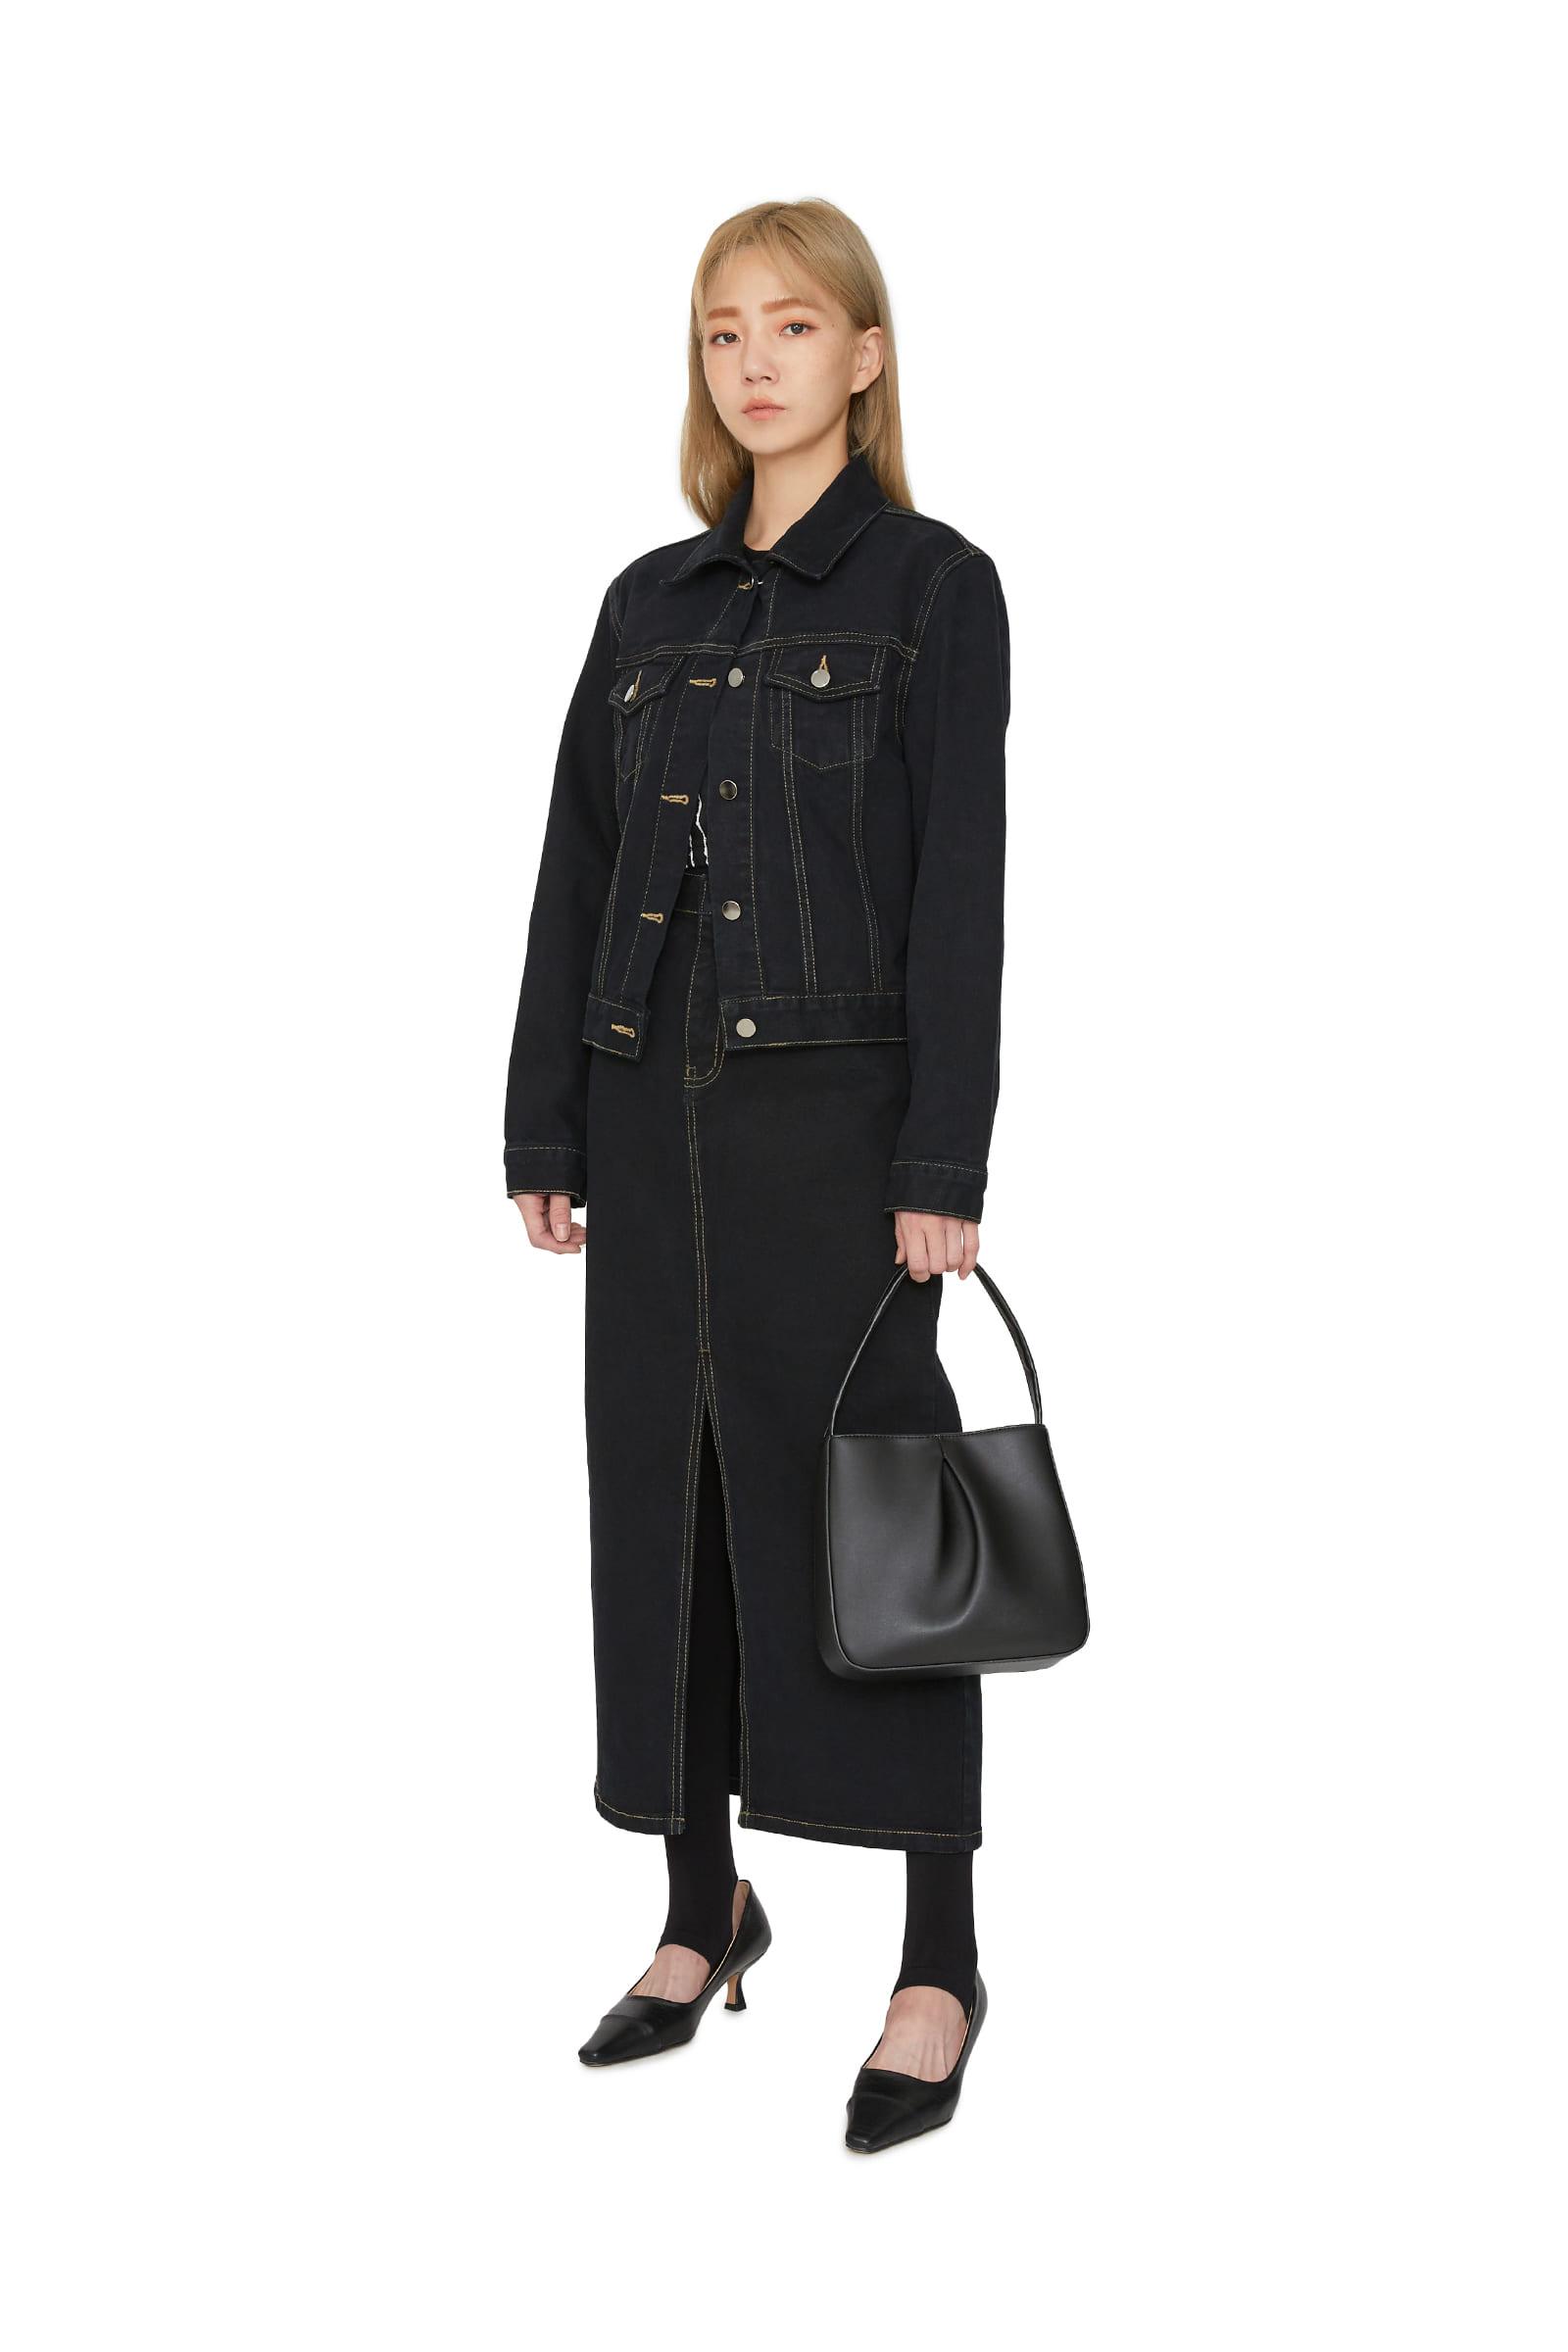 Autumn standard denim jacket